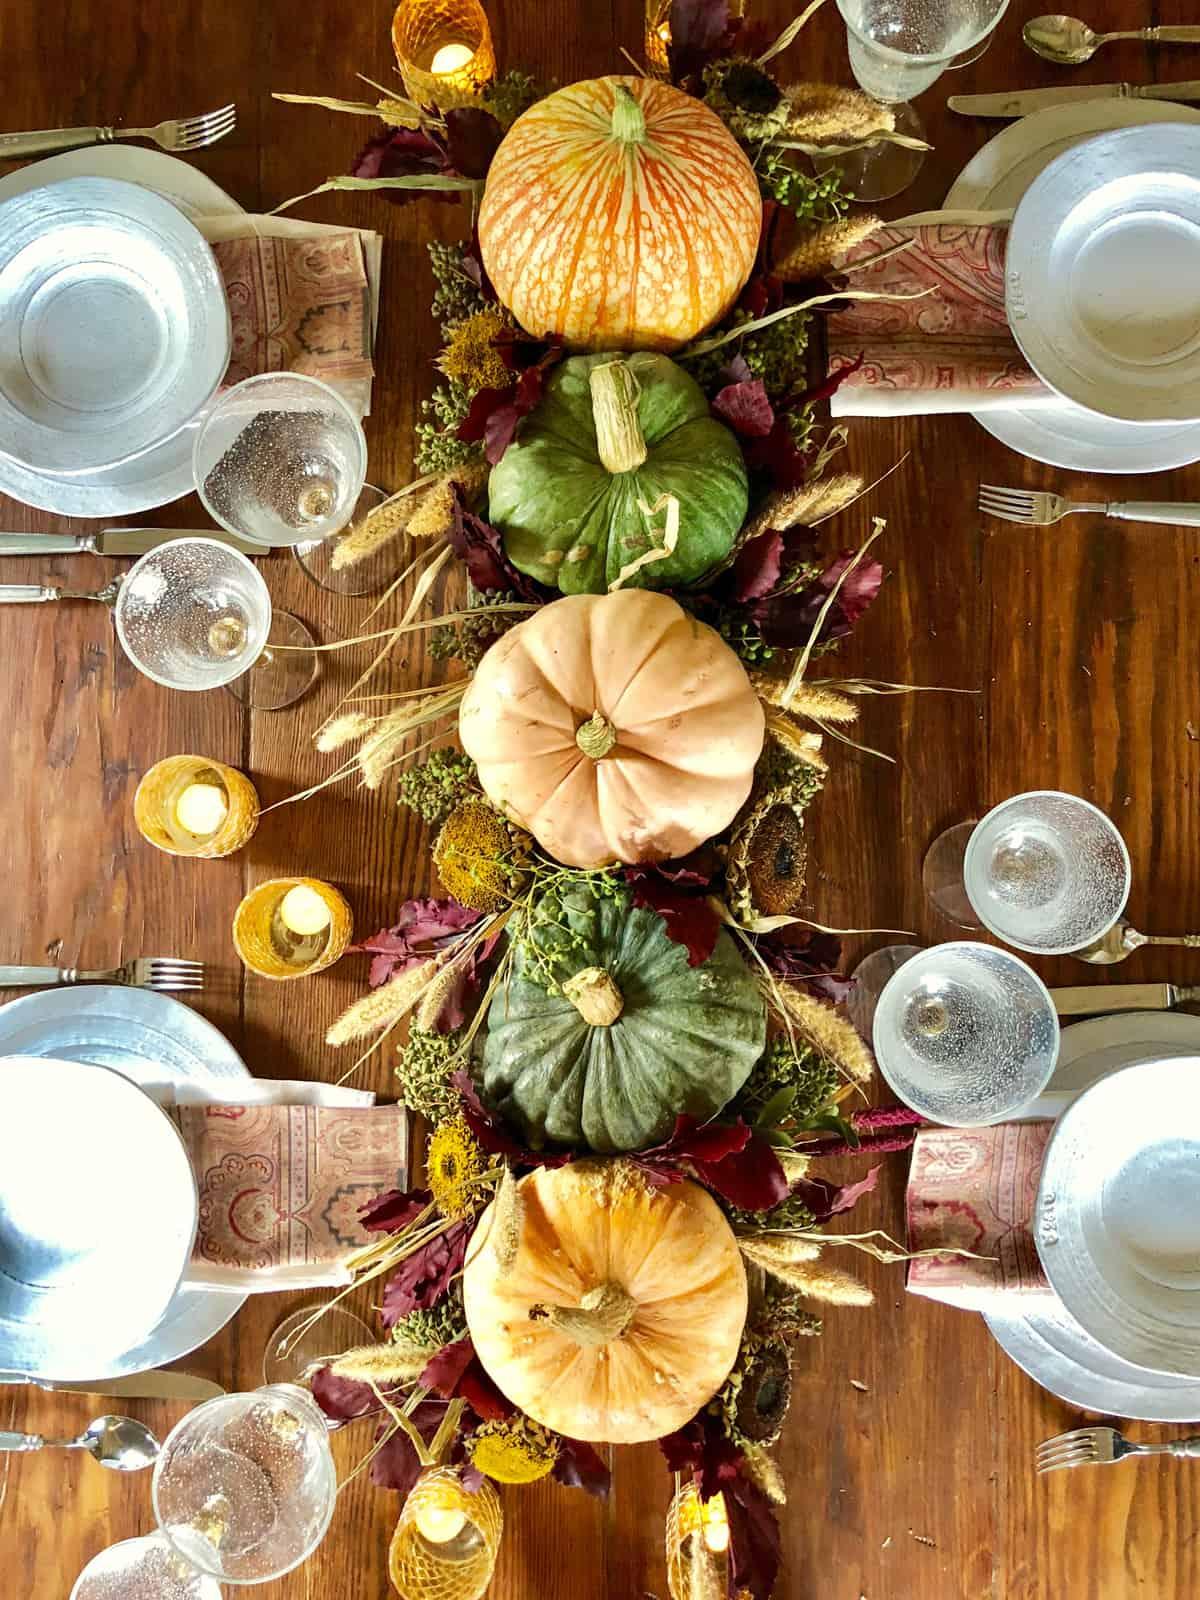 tablesape with pumpkins,privet, wheat